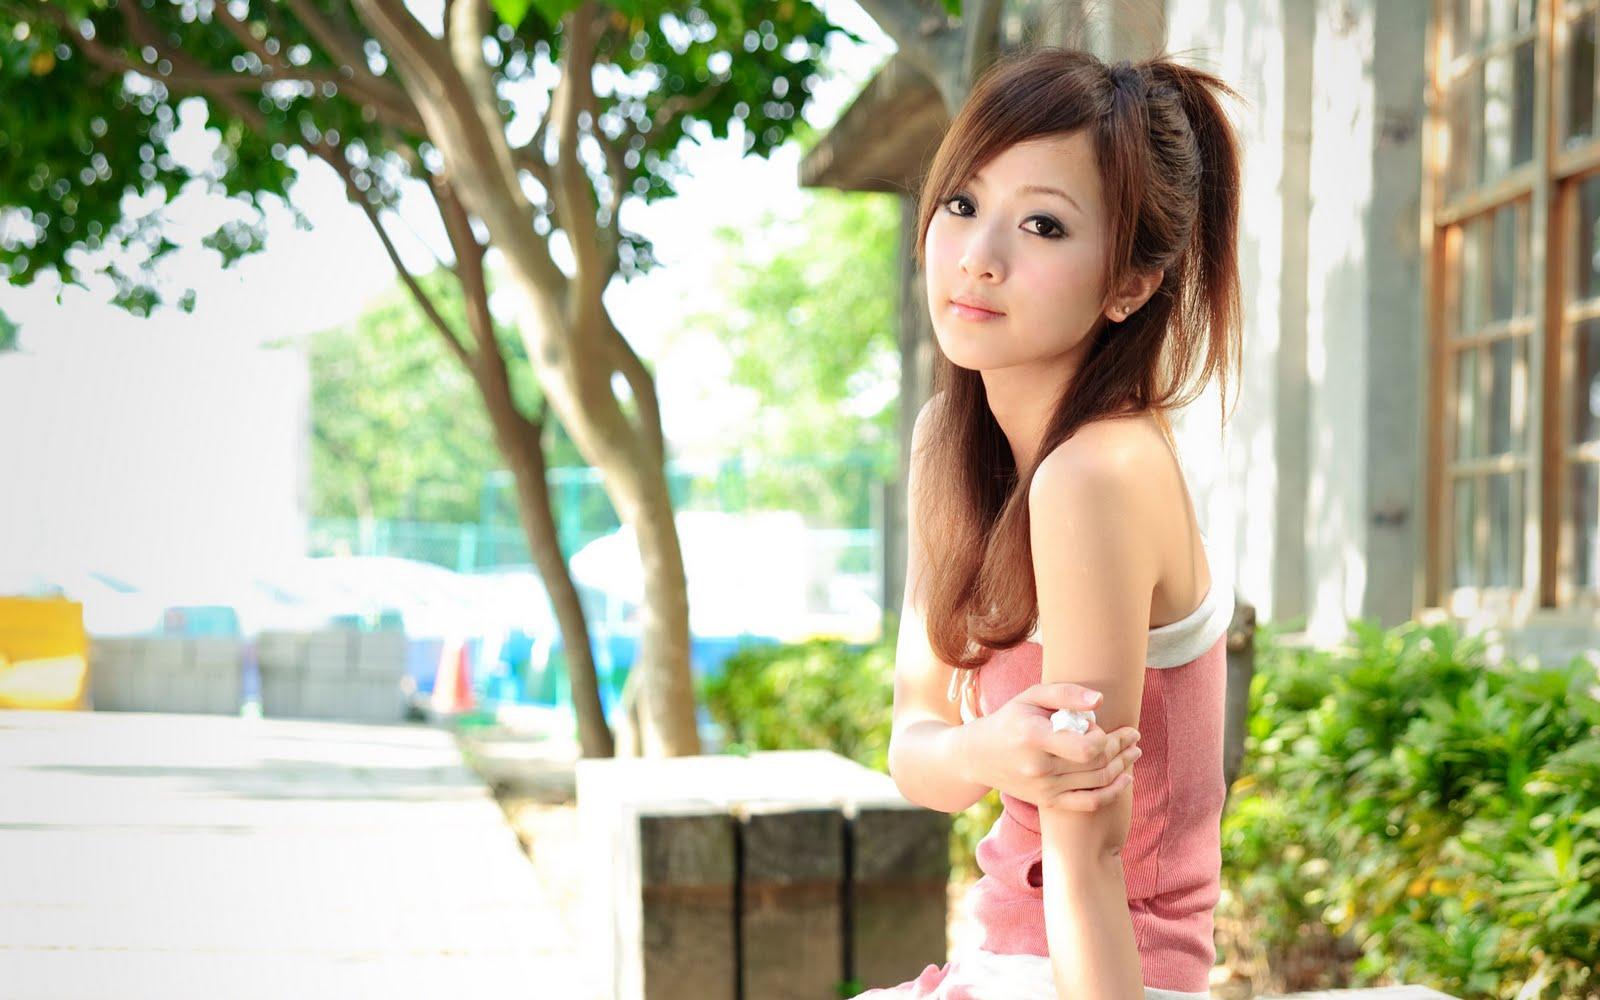 cute asian girls wallpaper - sf wallpaper